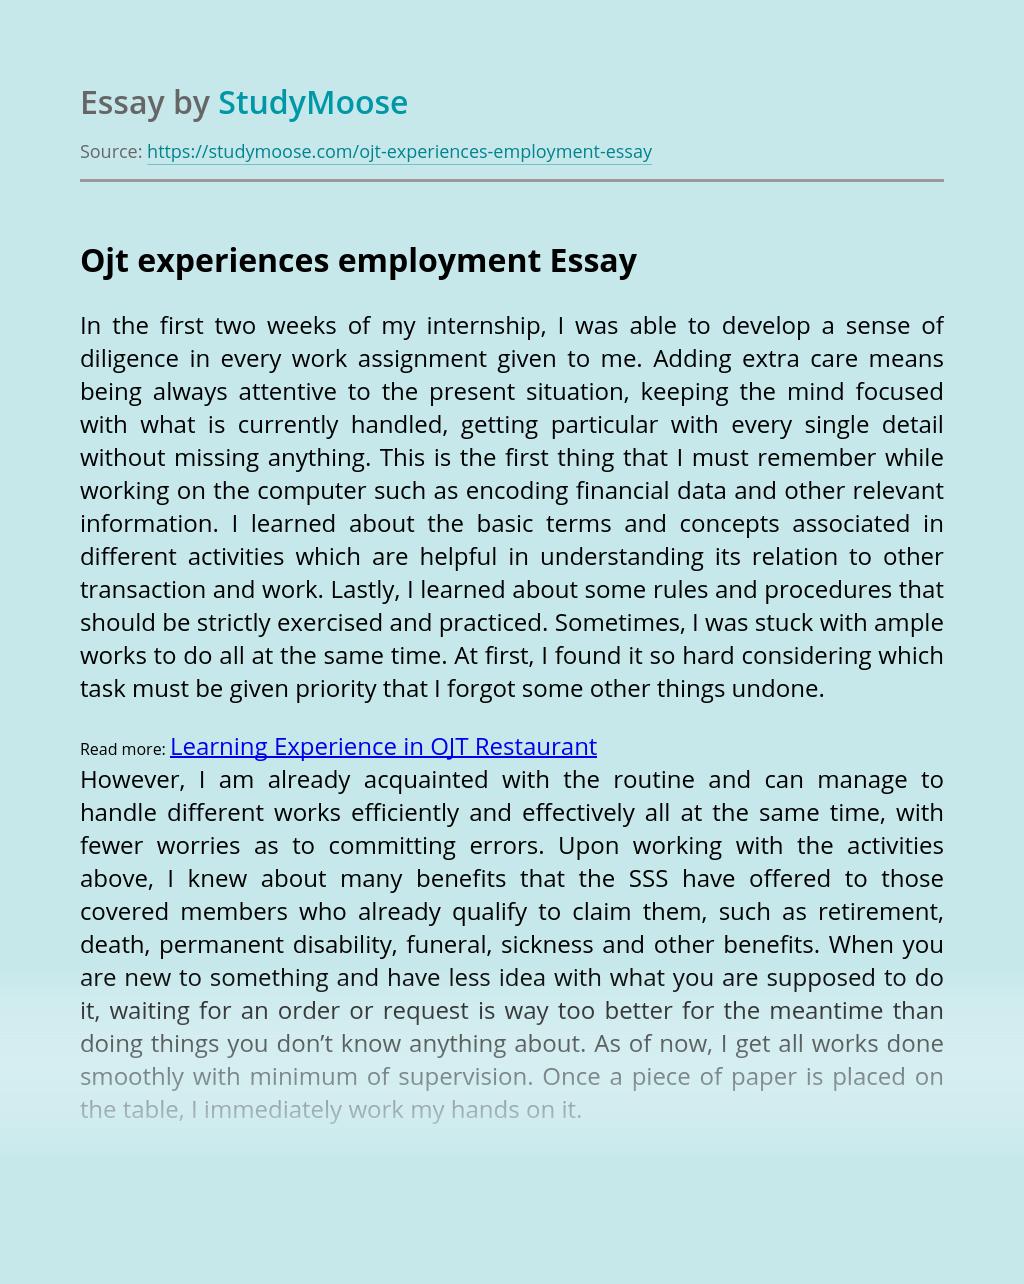 Ojt experiences employment